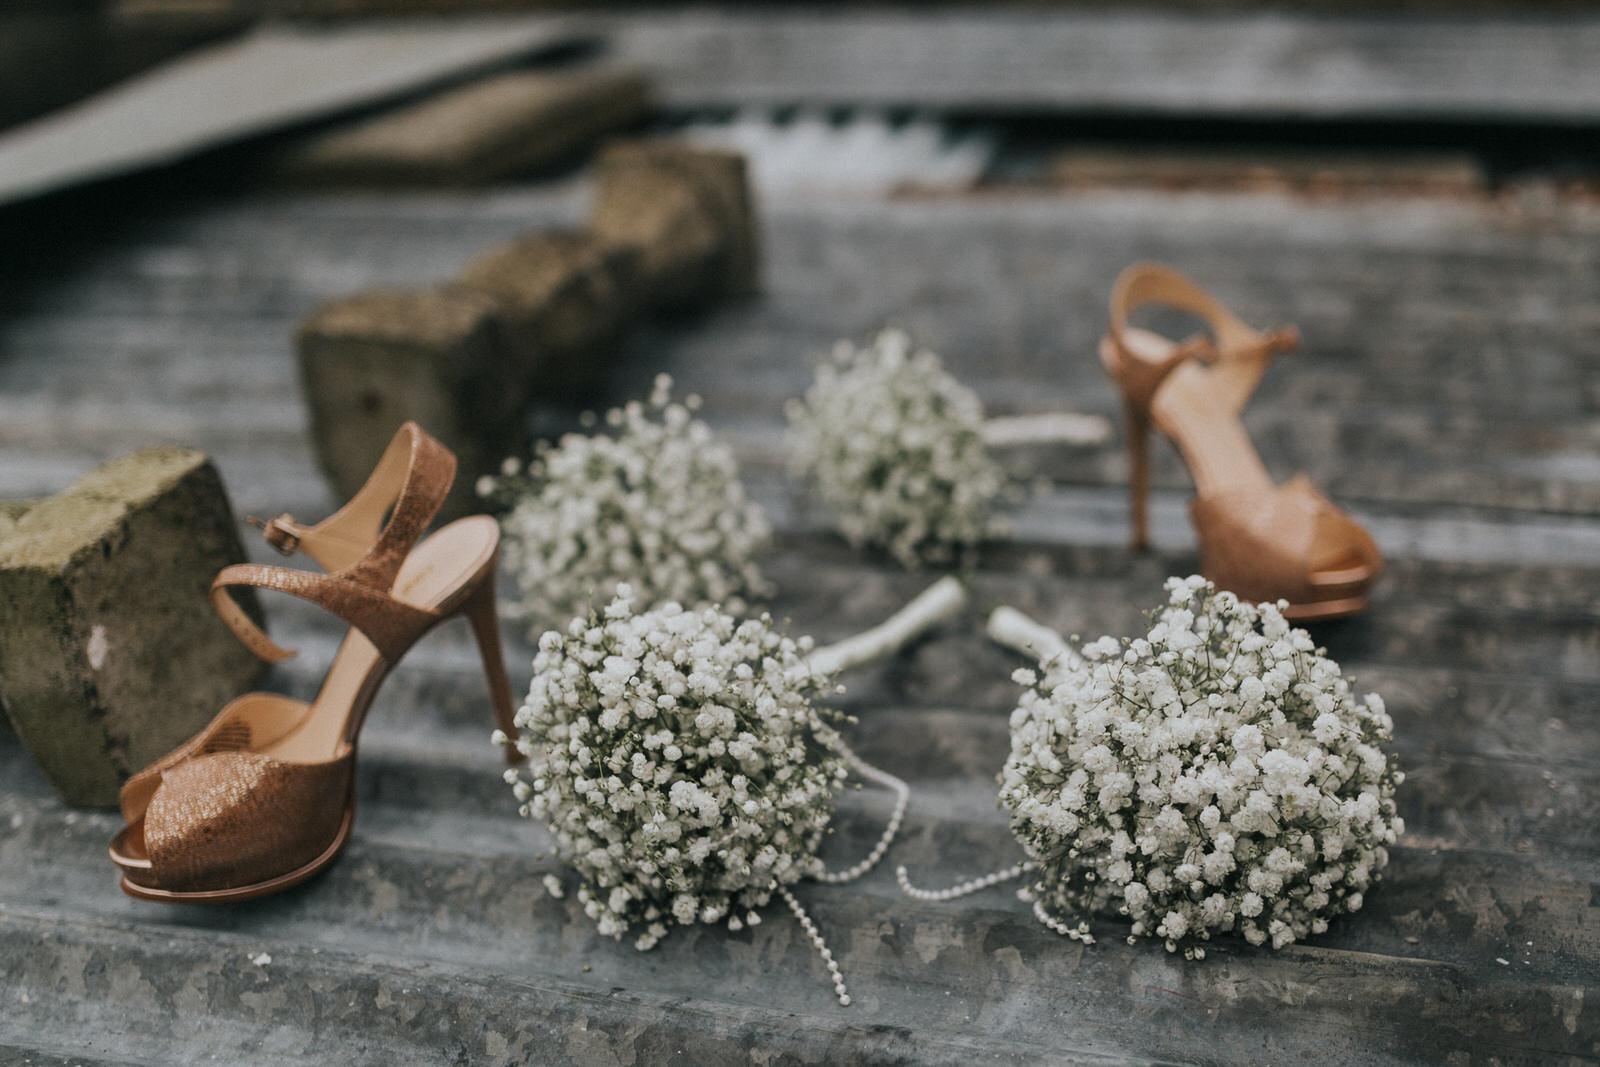 Clonabreany_wedding-photographer_roger_kenny_ireland_008.jpg